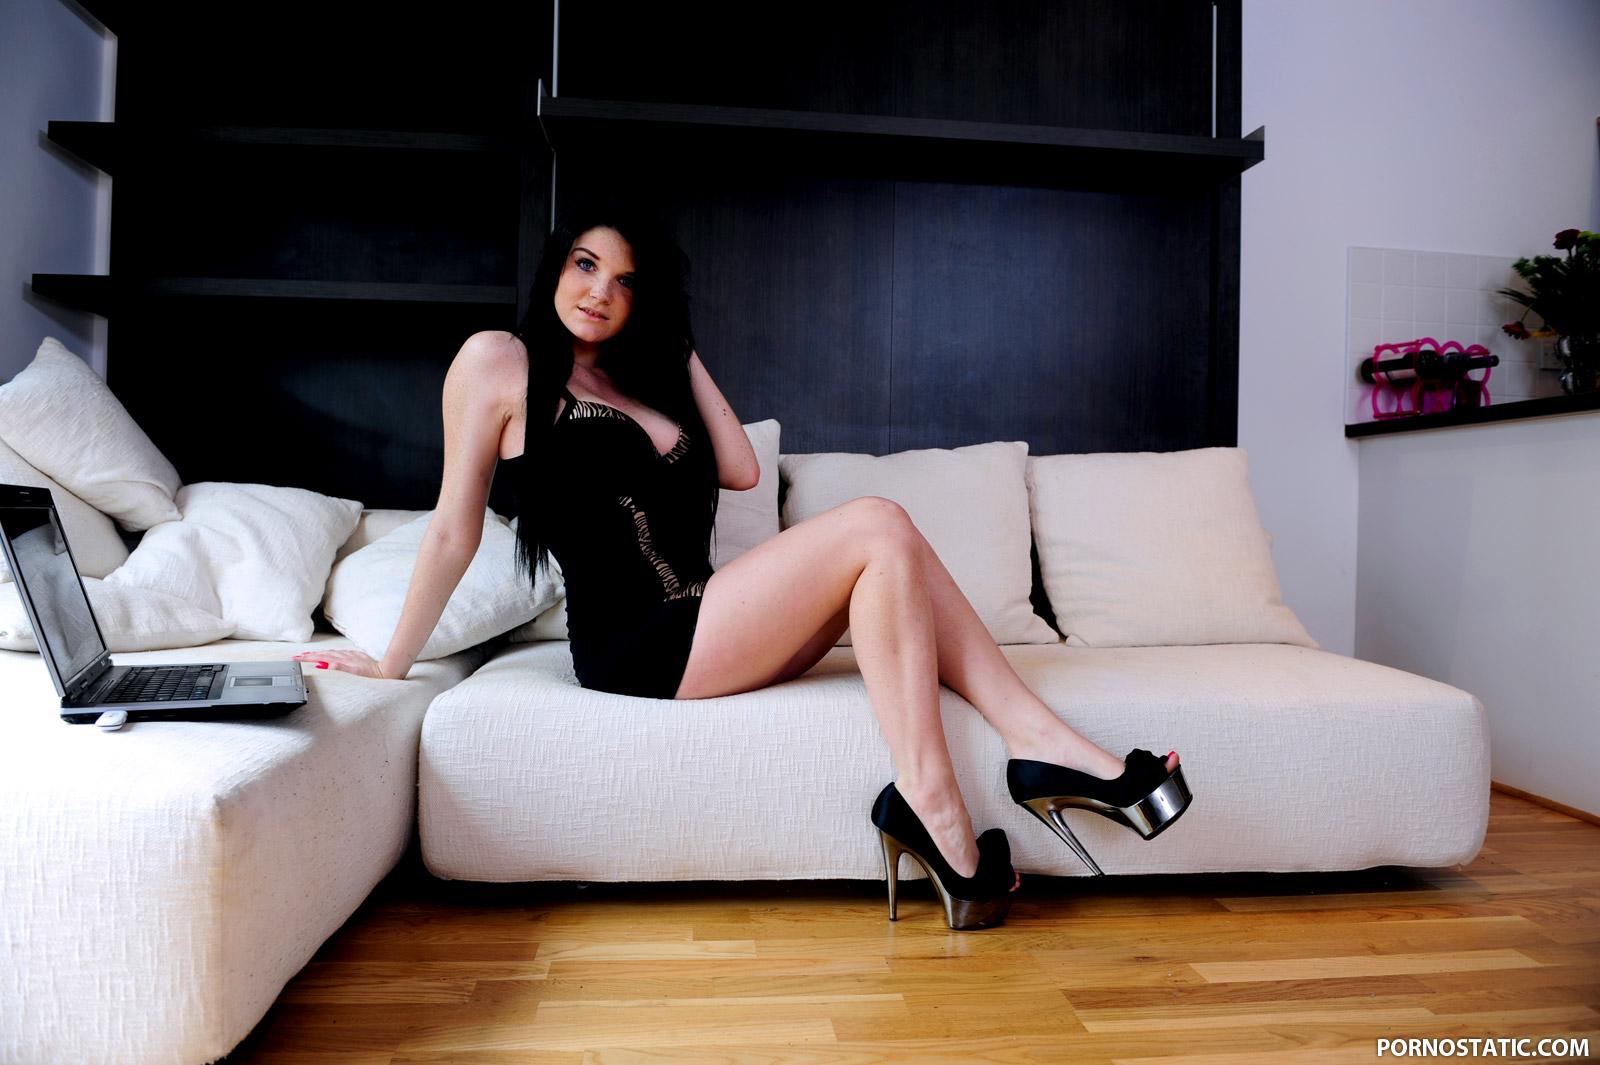 Tessa Thrills - At Home With Tessa